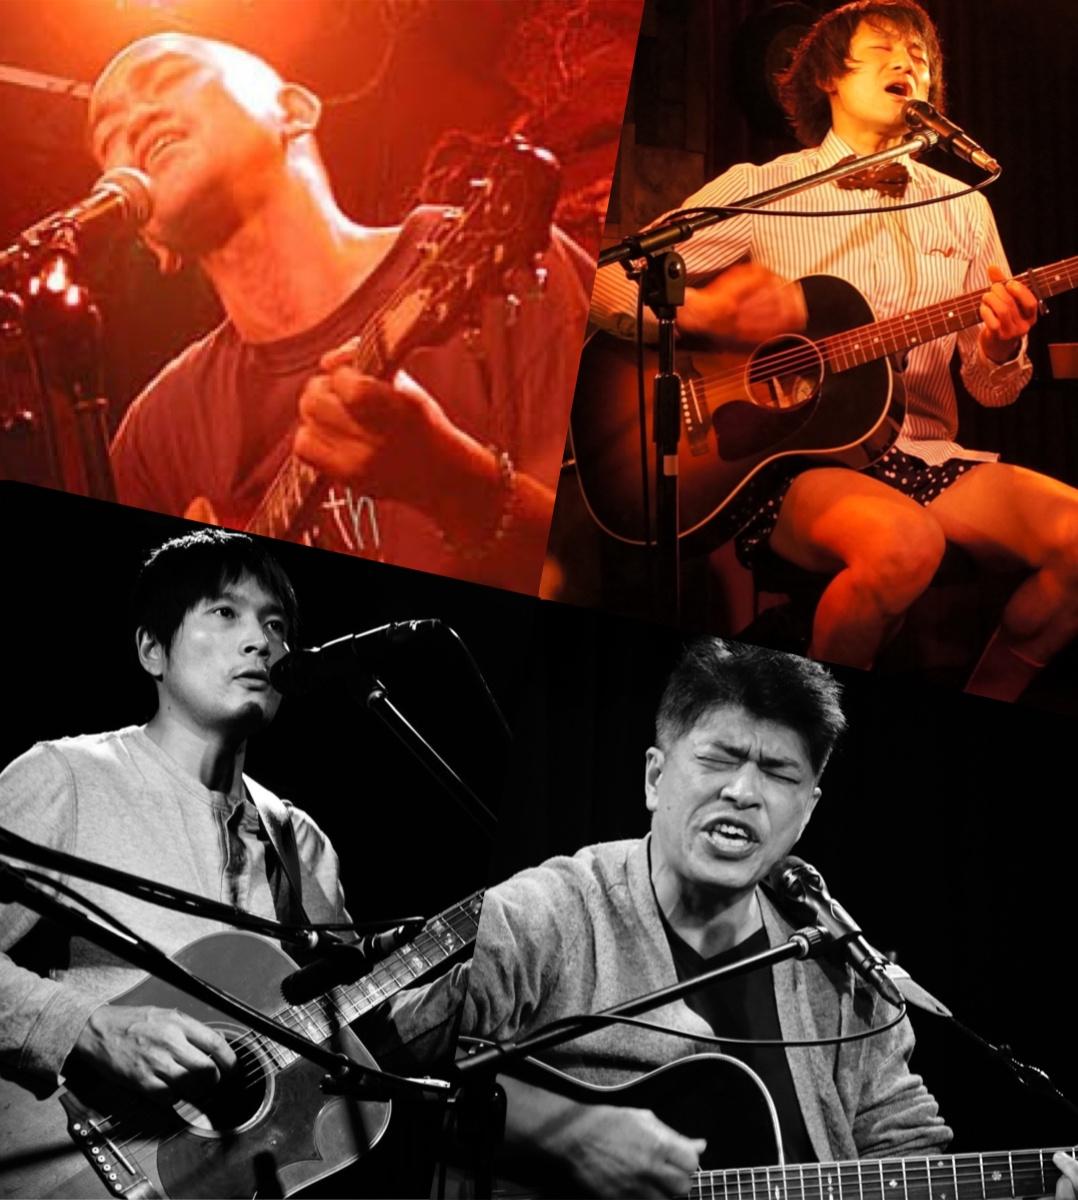 『TOKYO CROSSROAD BLUES』出演:Shanti Tetsu / 泥水すする / 早川理史 / 栁下学